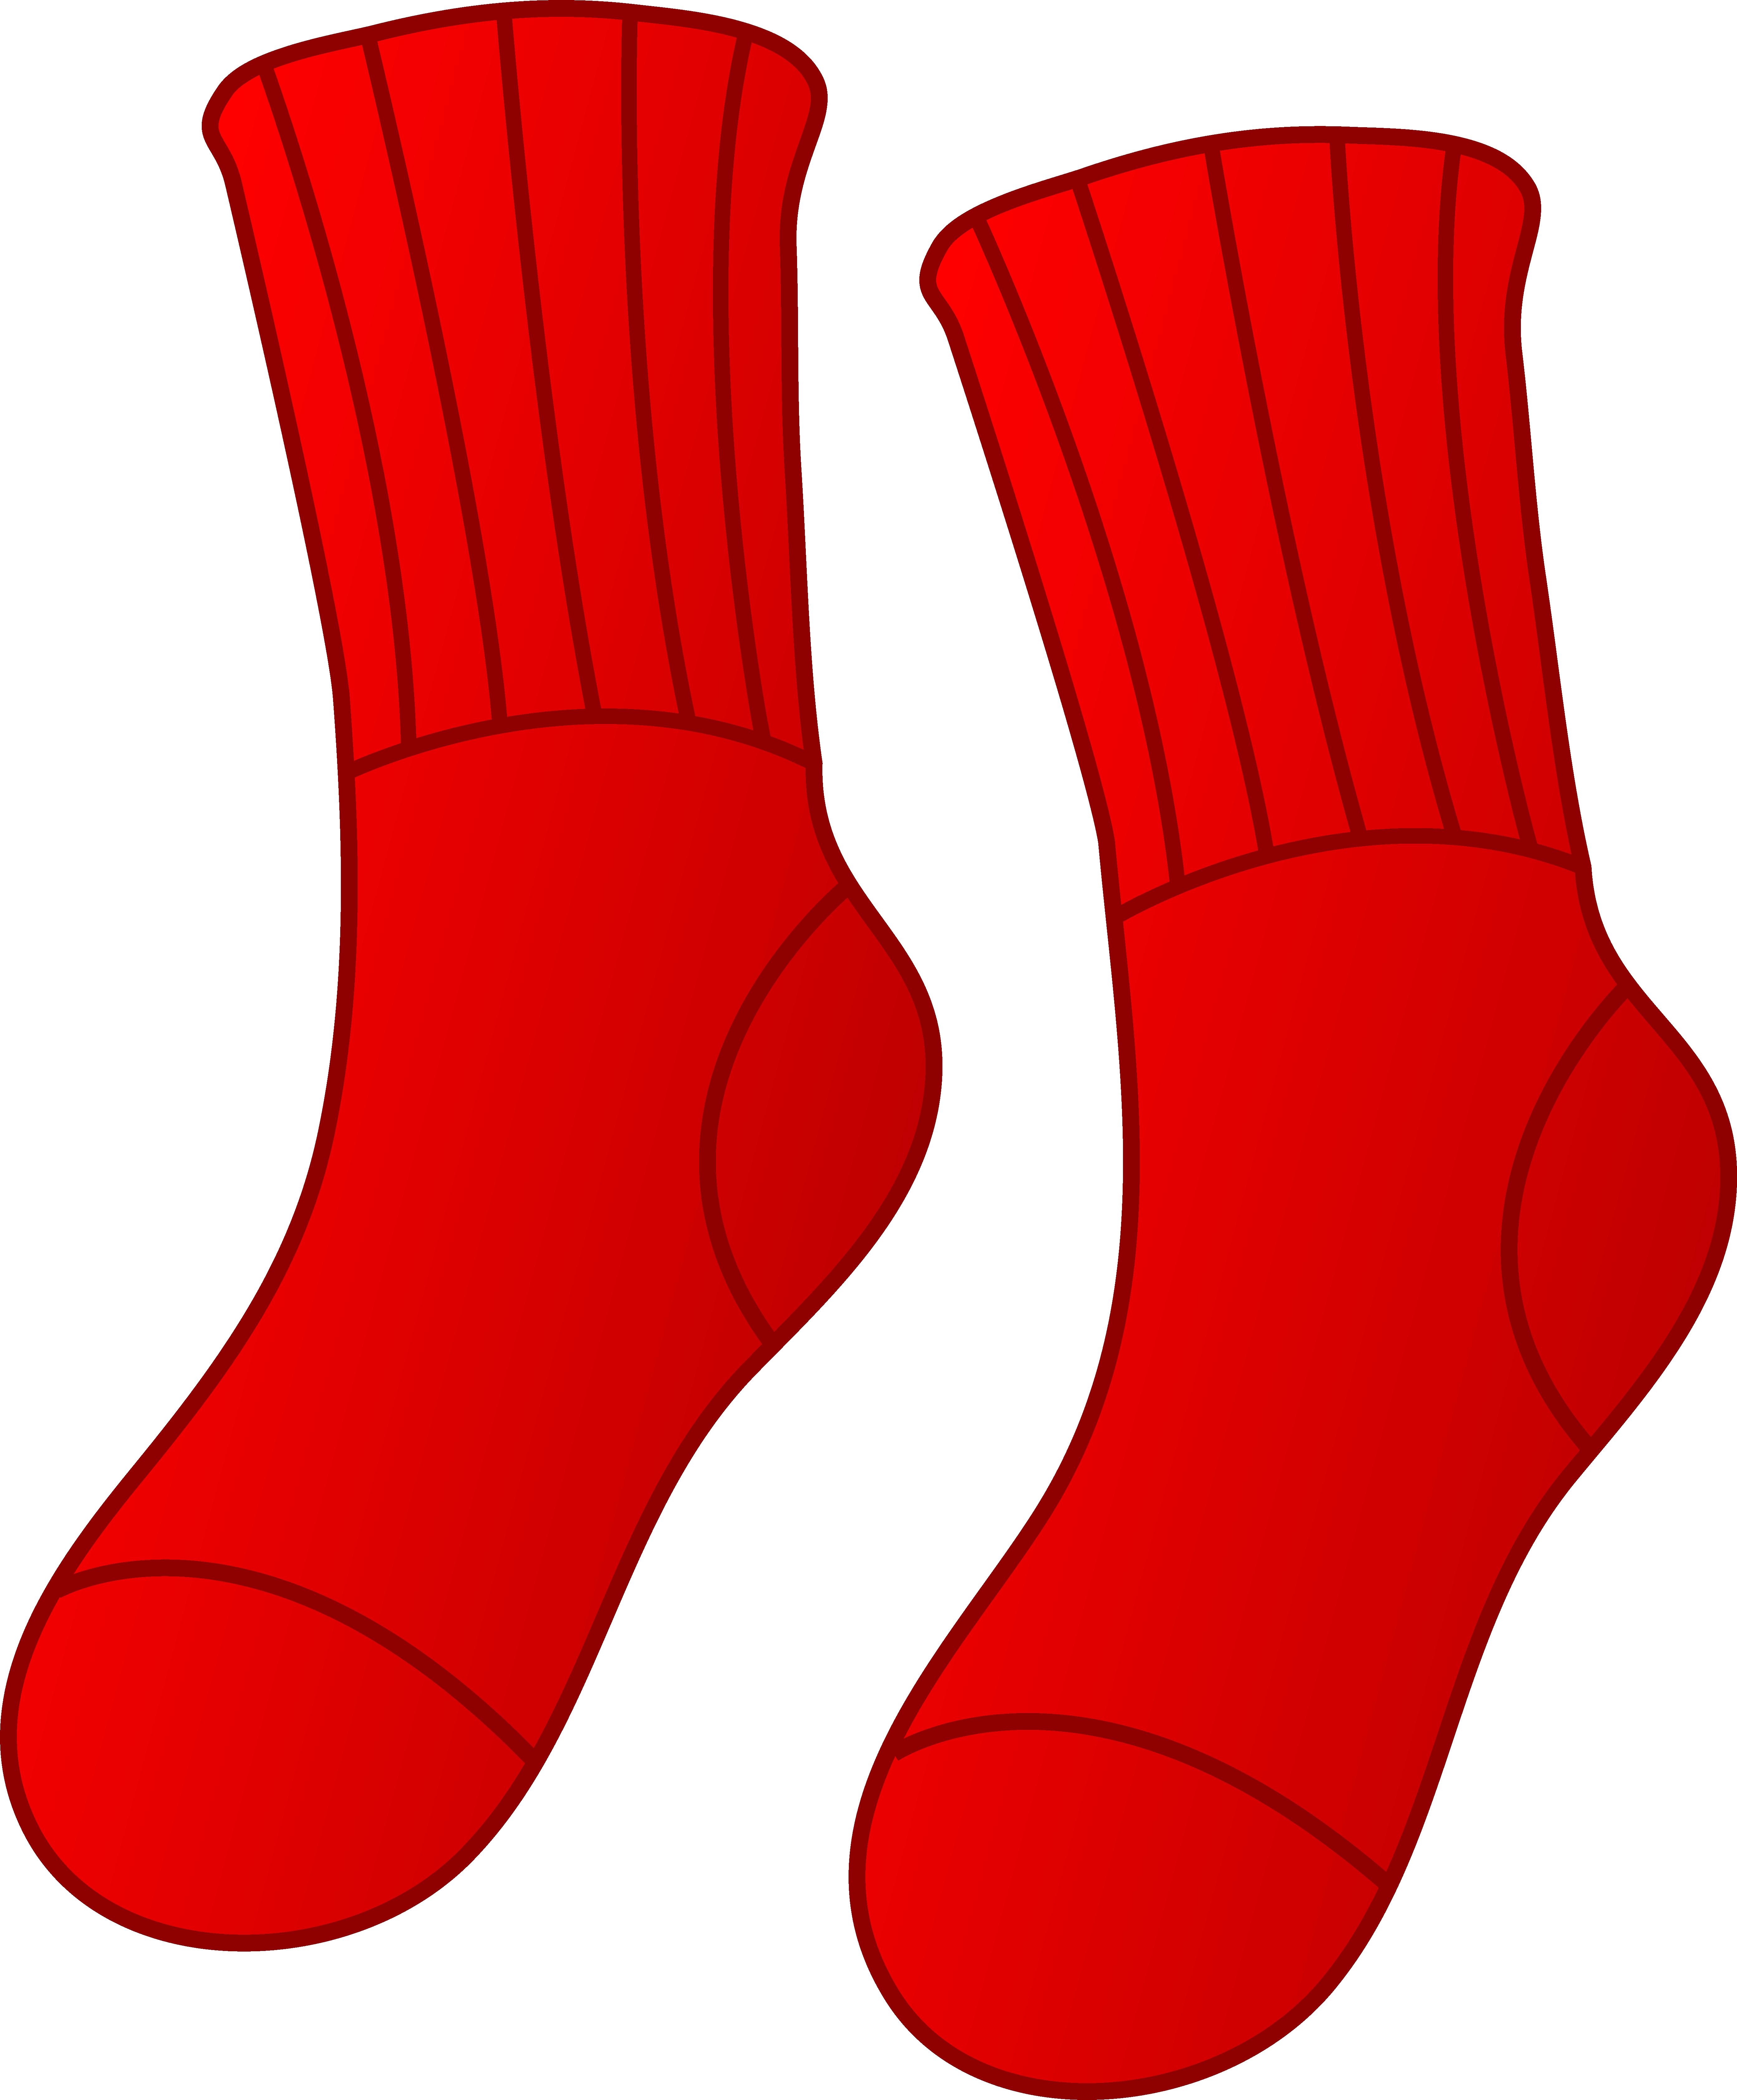 5570x6735 Pair Of Red Socks